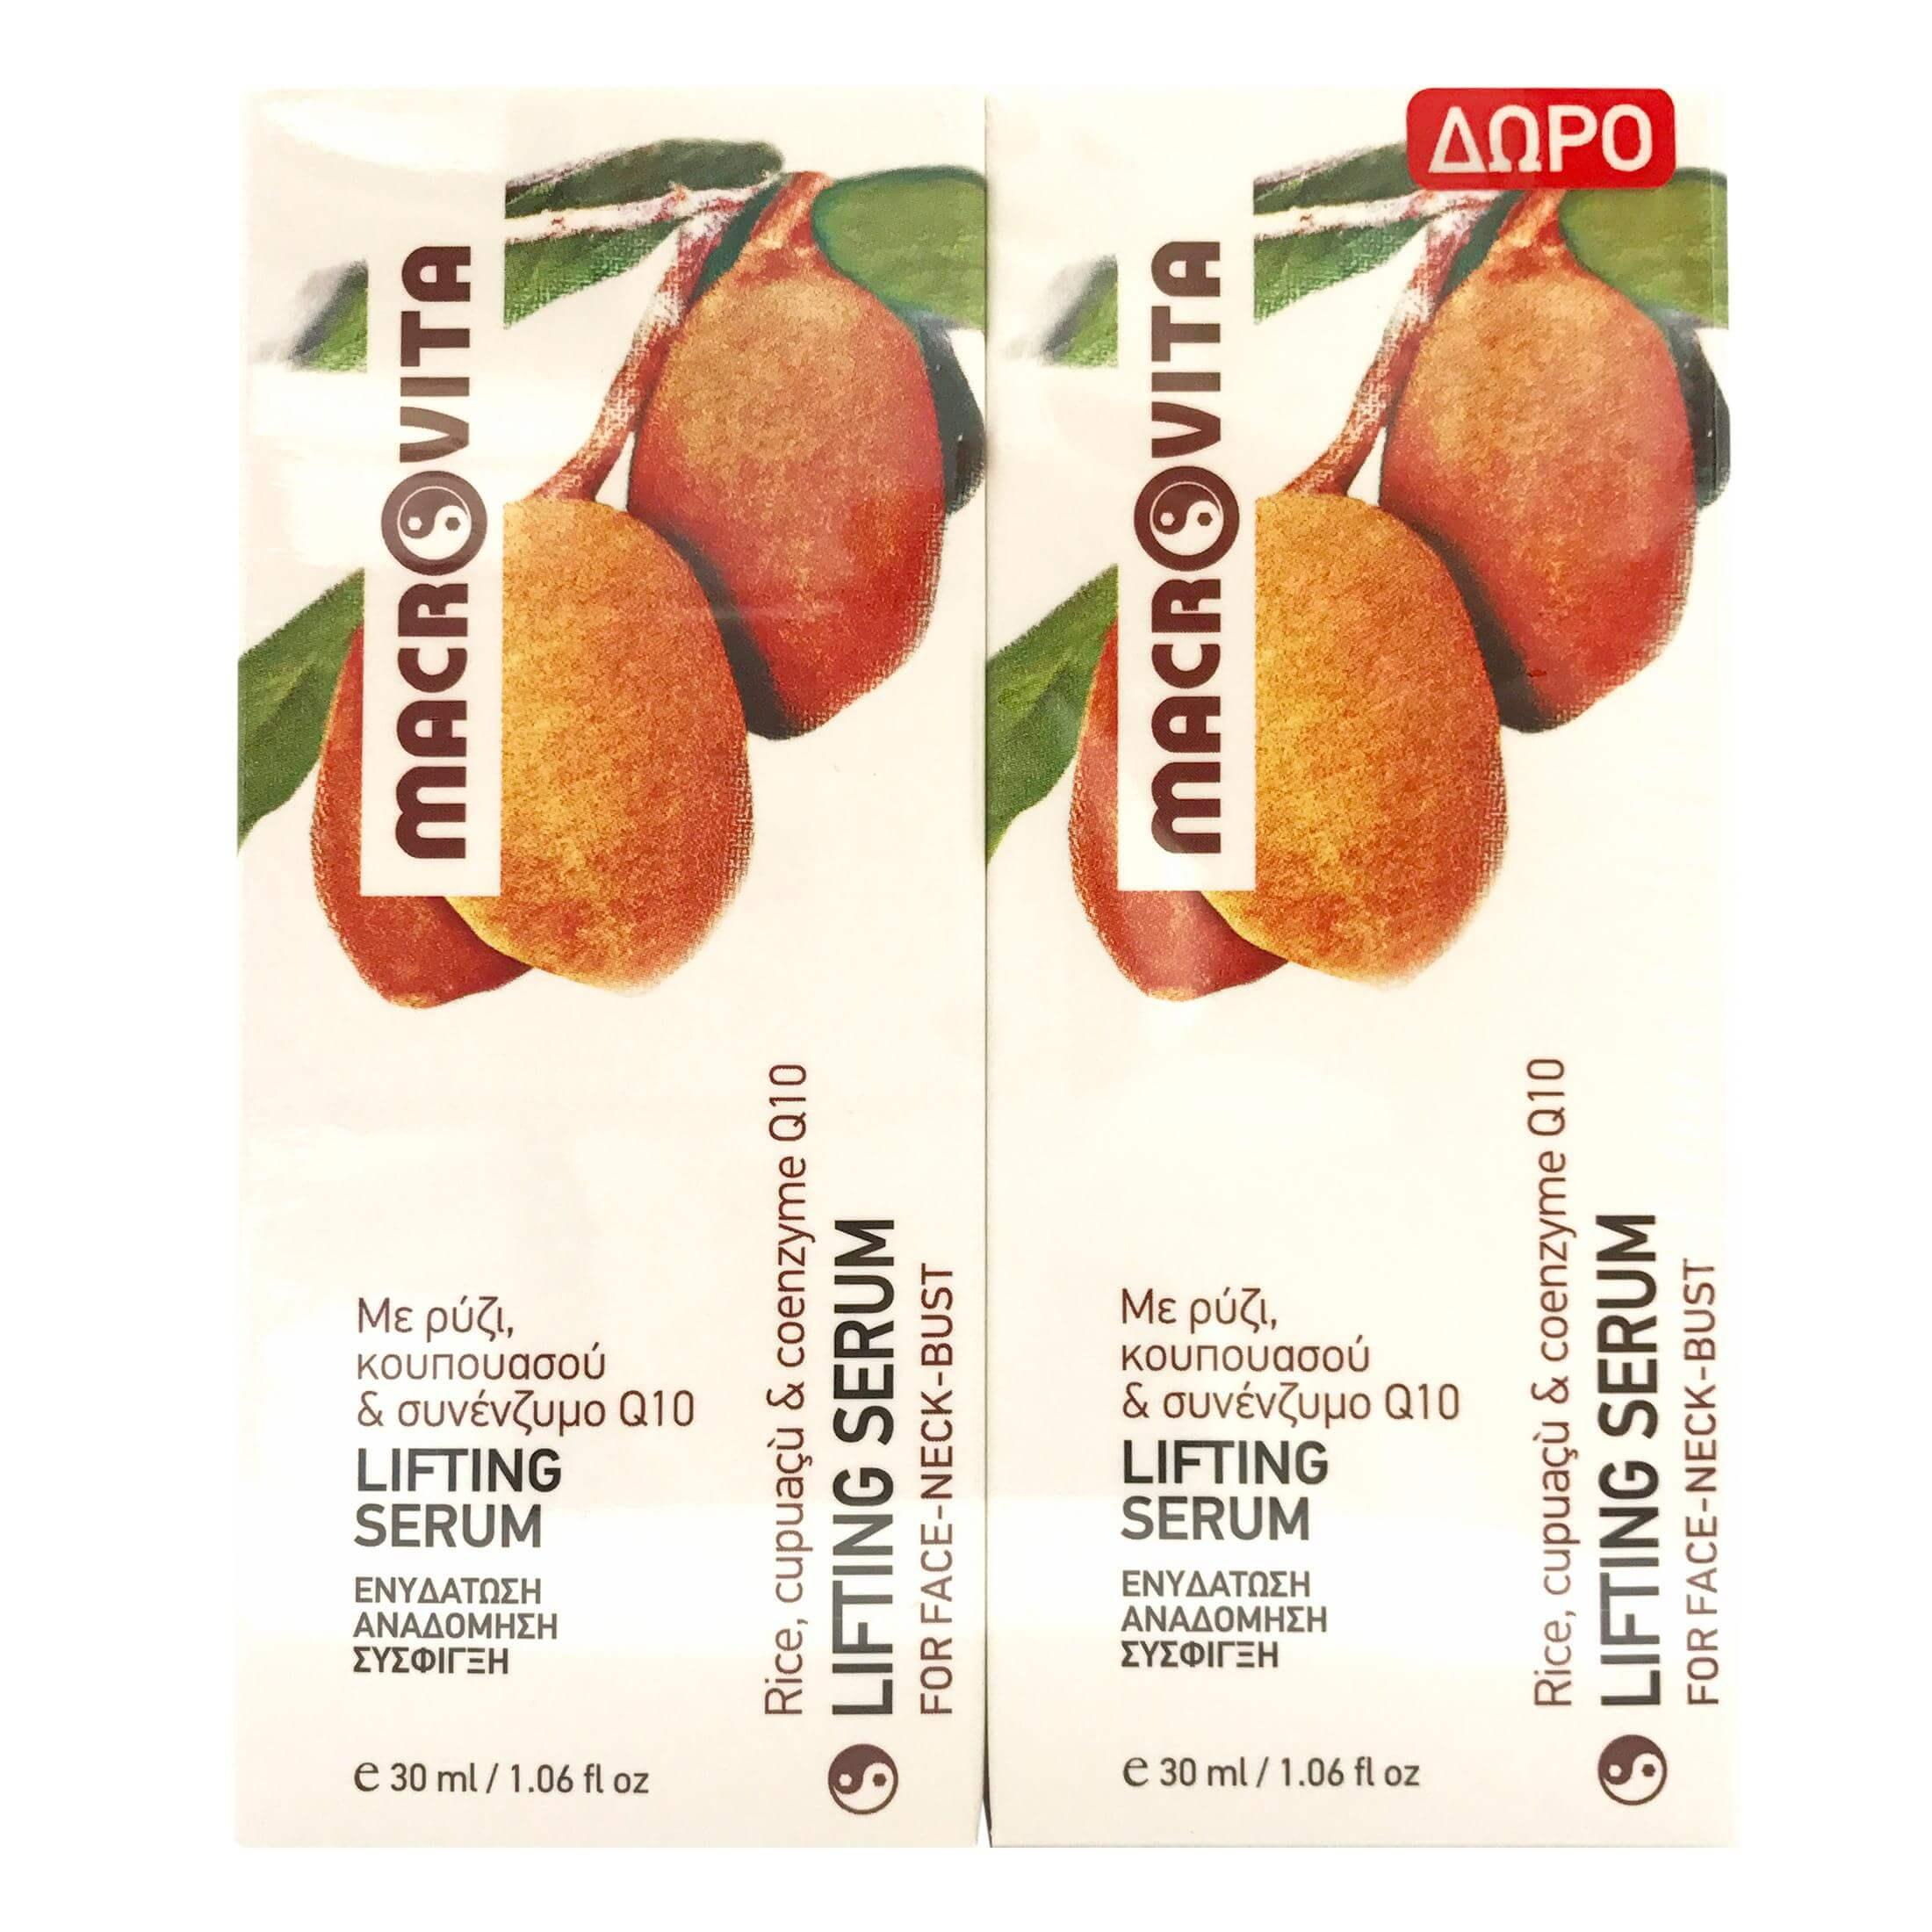 Macrovita Ανορθωτικός Ορός Lifting Serum για Πρόσωπο, Λαιμό, Ντεκολτέ 1+1 30ml